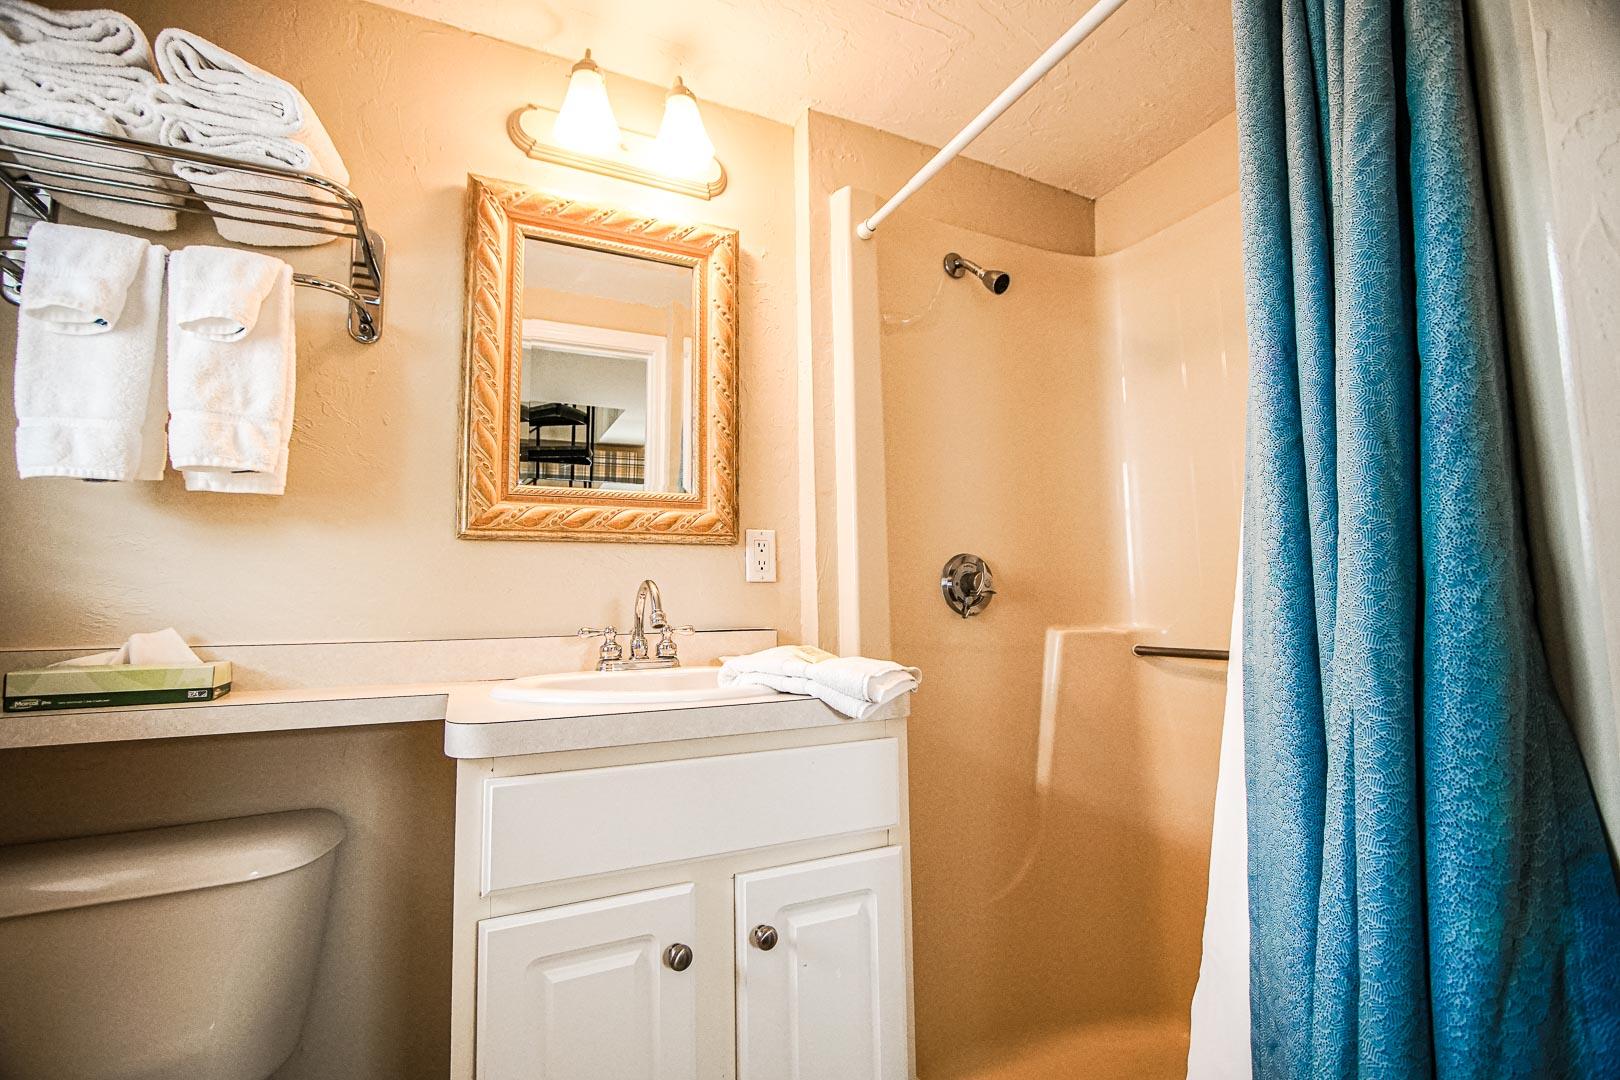 A standard bathroom at VRI's Cape Winds Resort in Massachusetts.